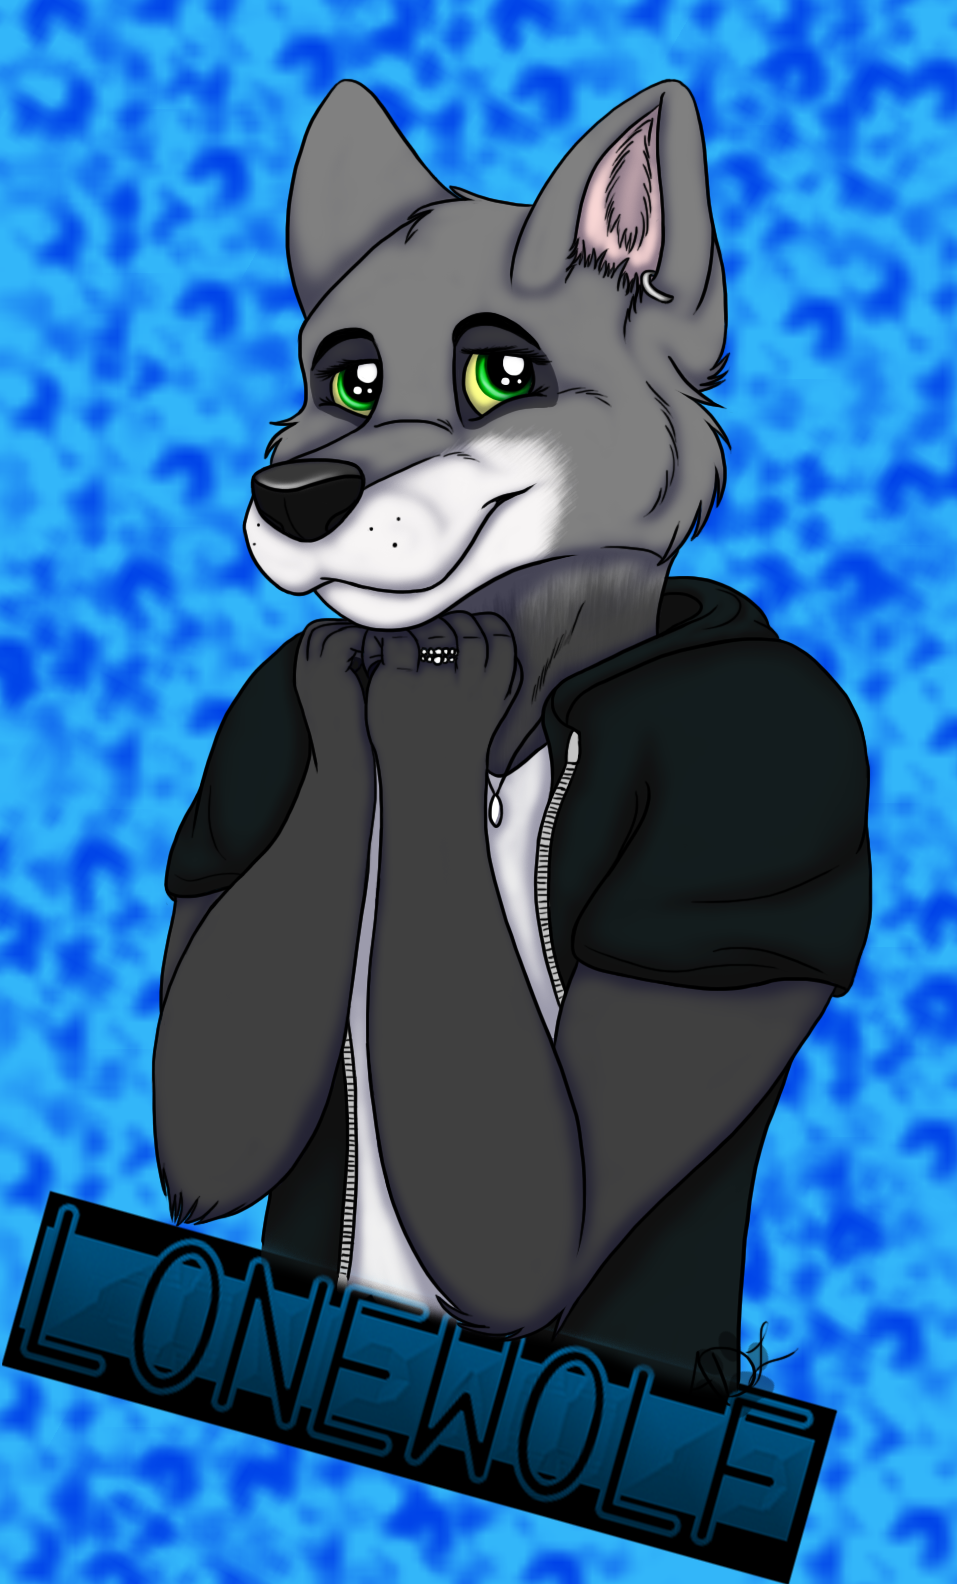 Lonewolf Badge